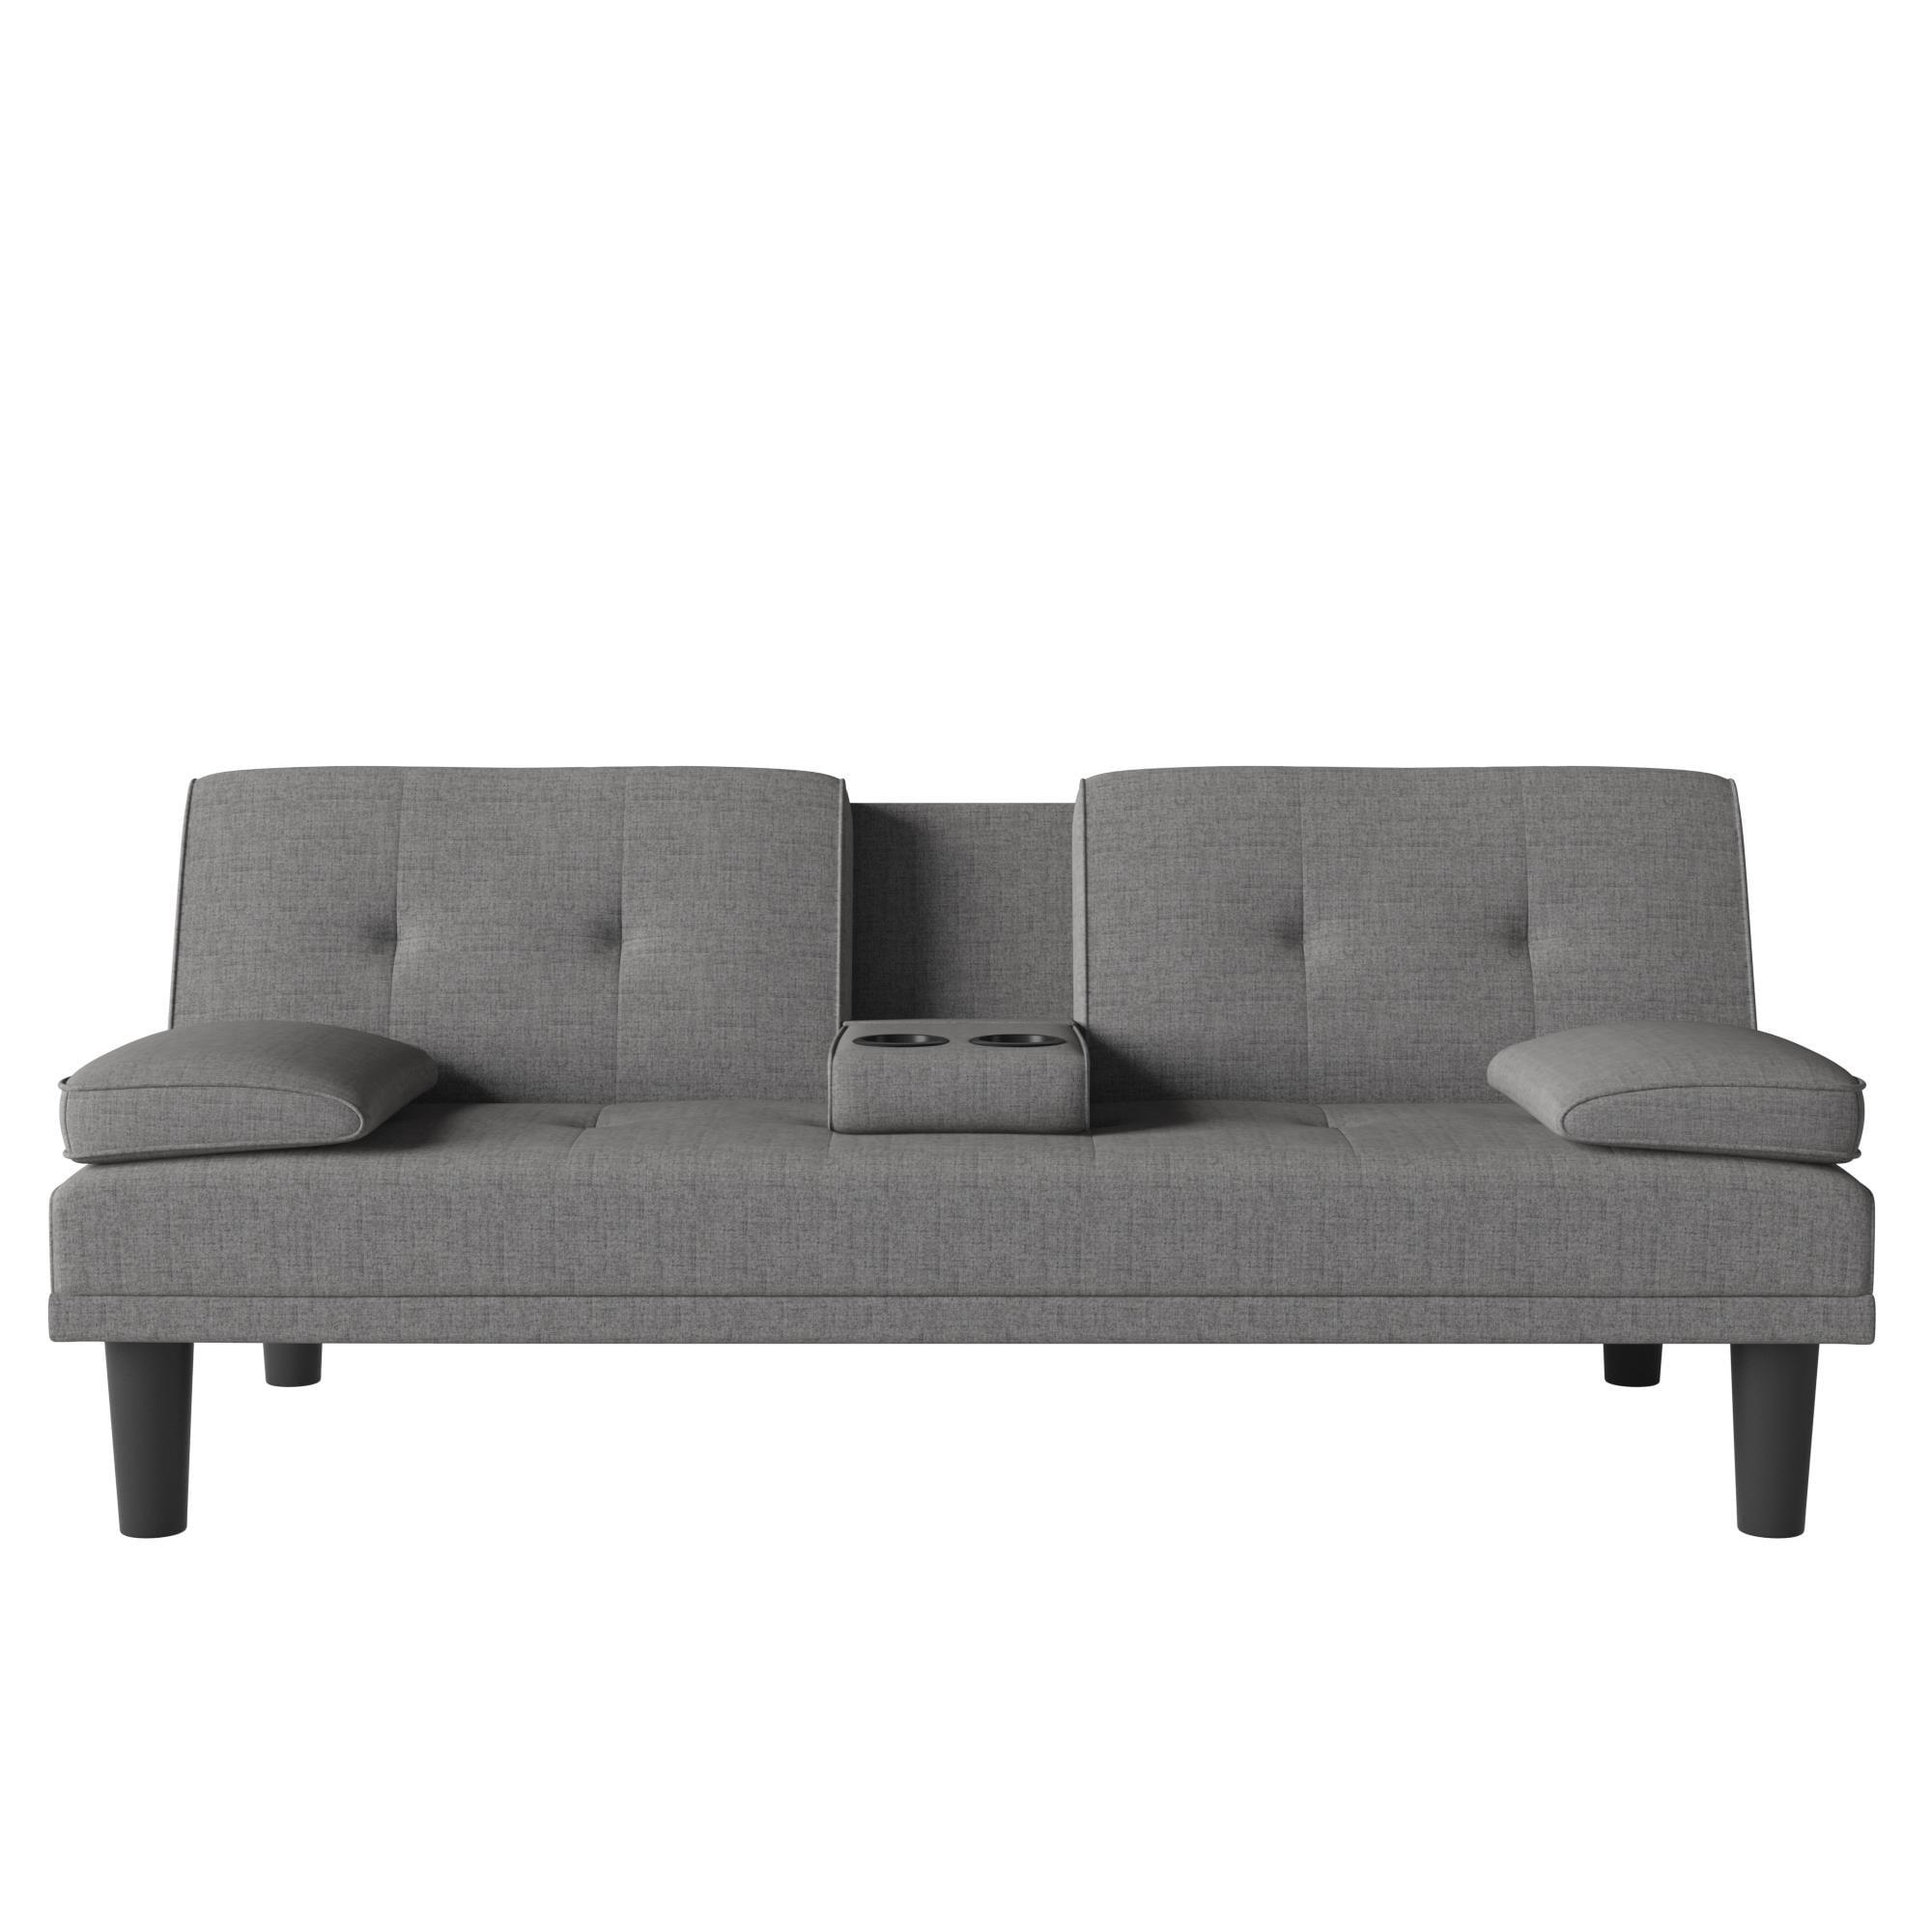 Avenue Greene Medley Cupholder Sofa Sleeper Futon with 2 pillows -  DO11472